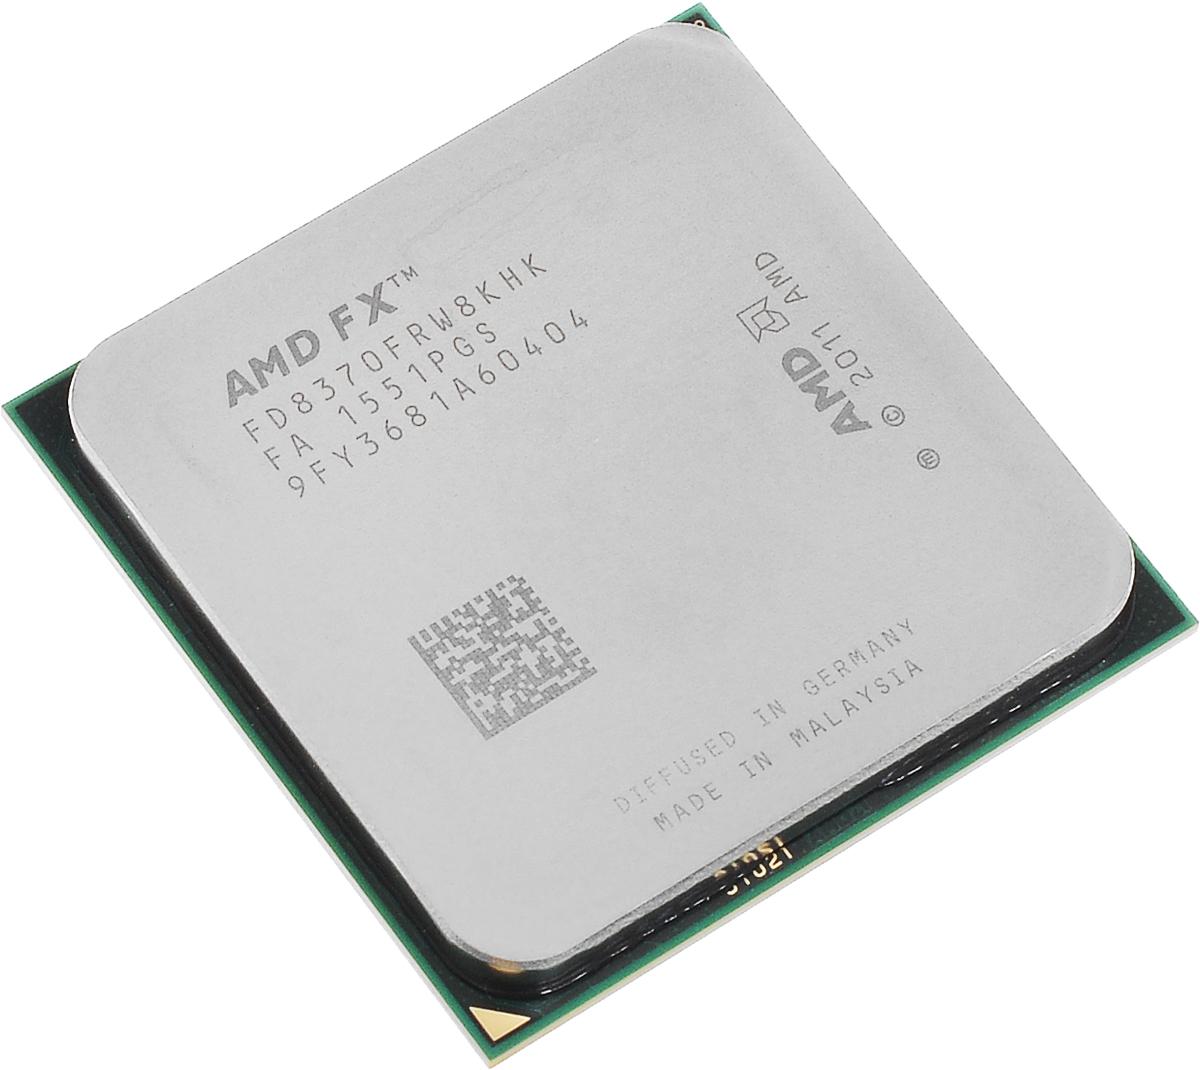 AMD FX-8370 процессор (FD8370FRW8KHK) - Комплектующие для компьютера